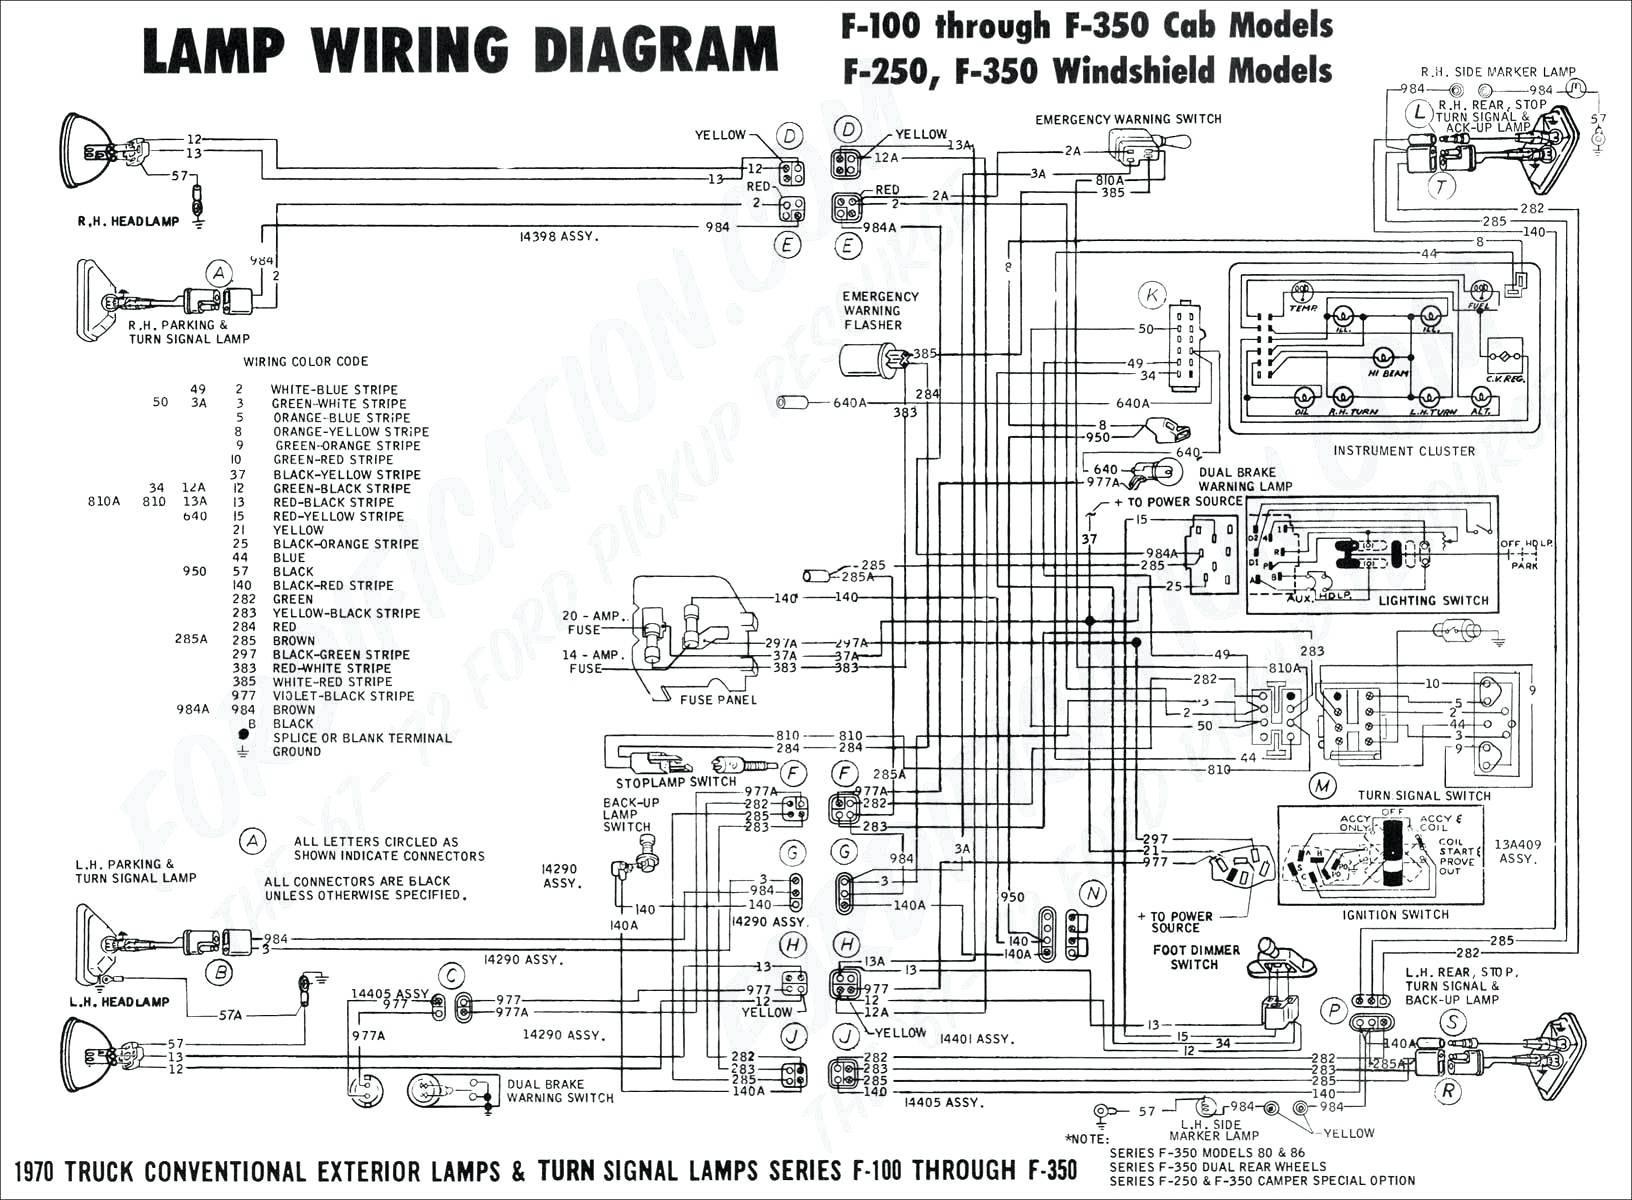 Daewoo Matiz Ecu Wiring Diagram   Machine Tools   Chevrolet Matiz Wiring Diagram      Machine Tools